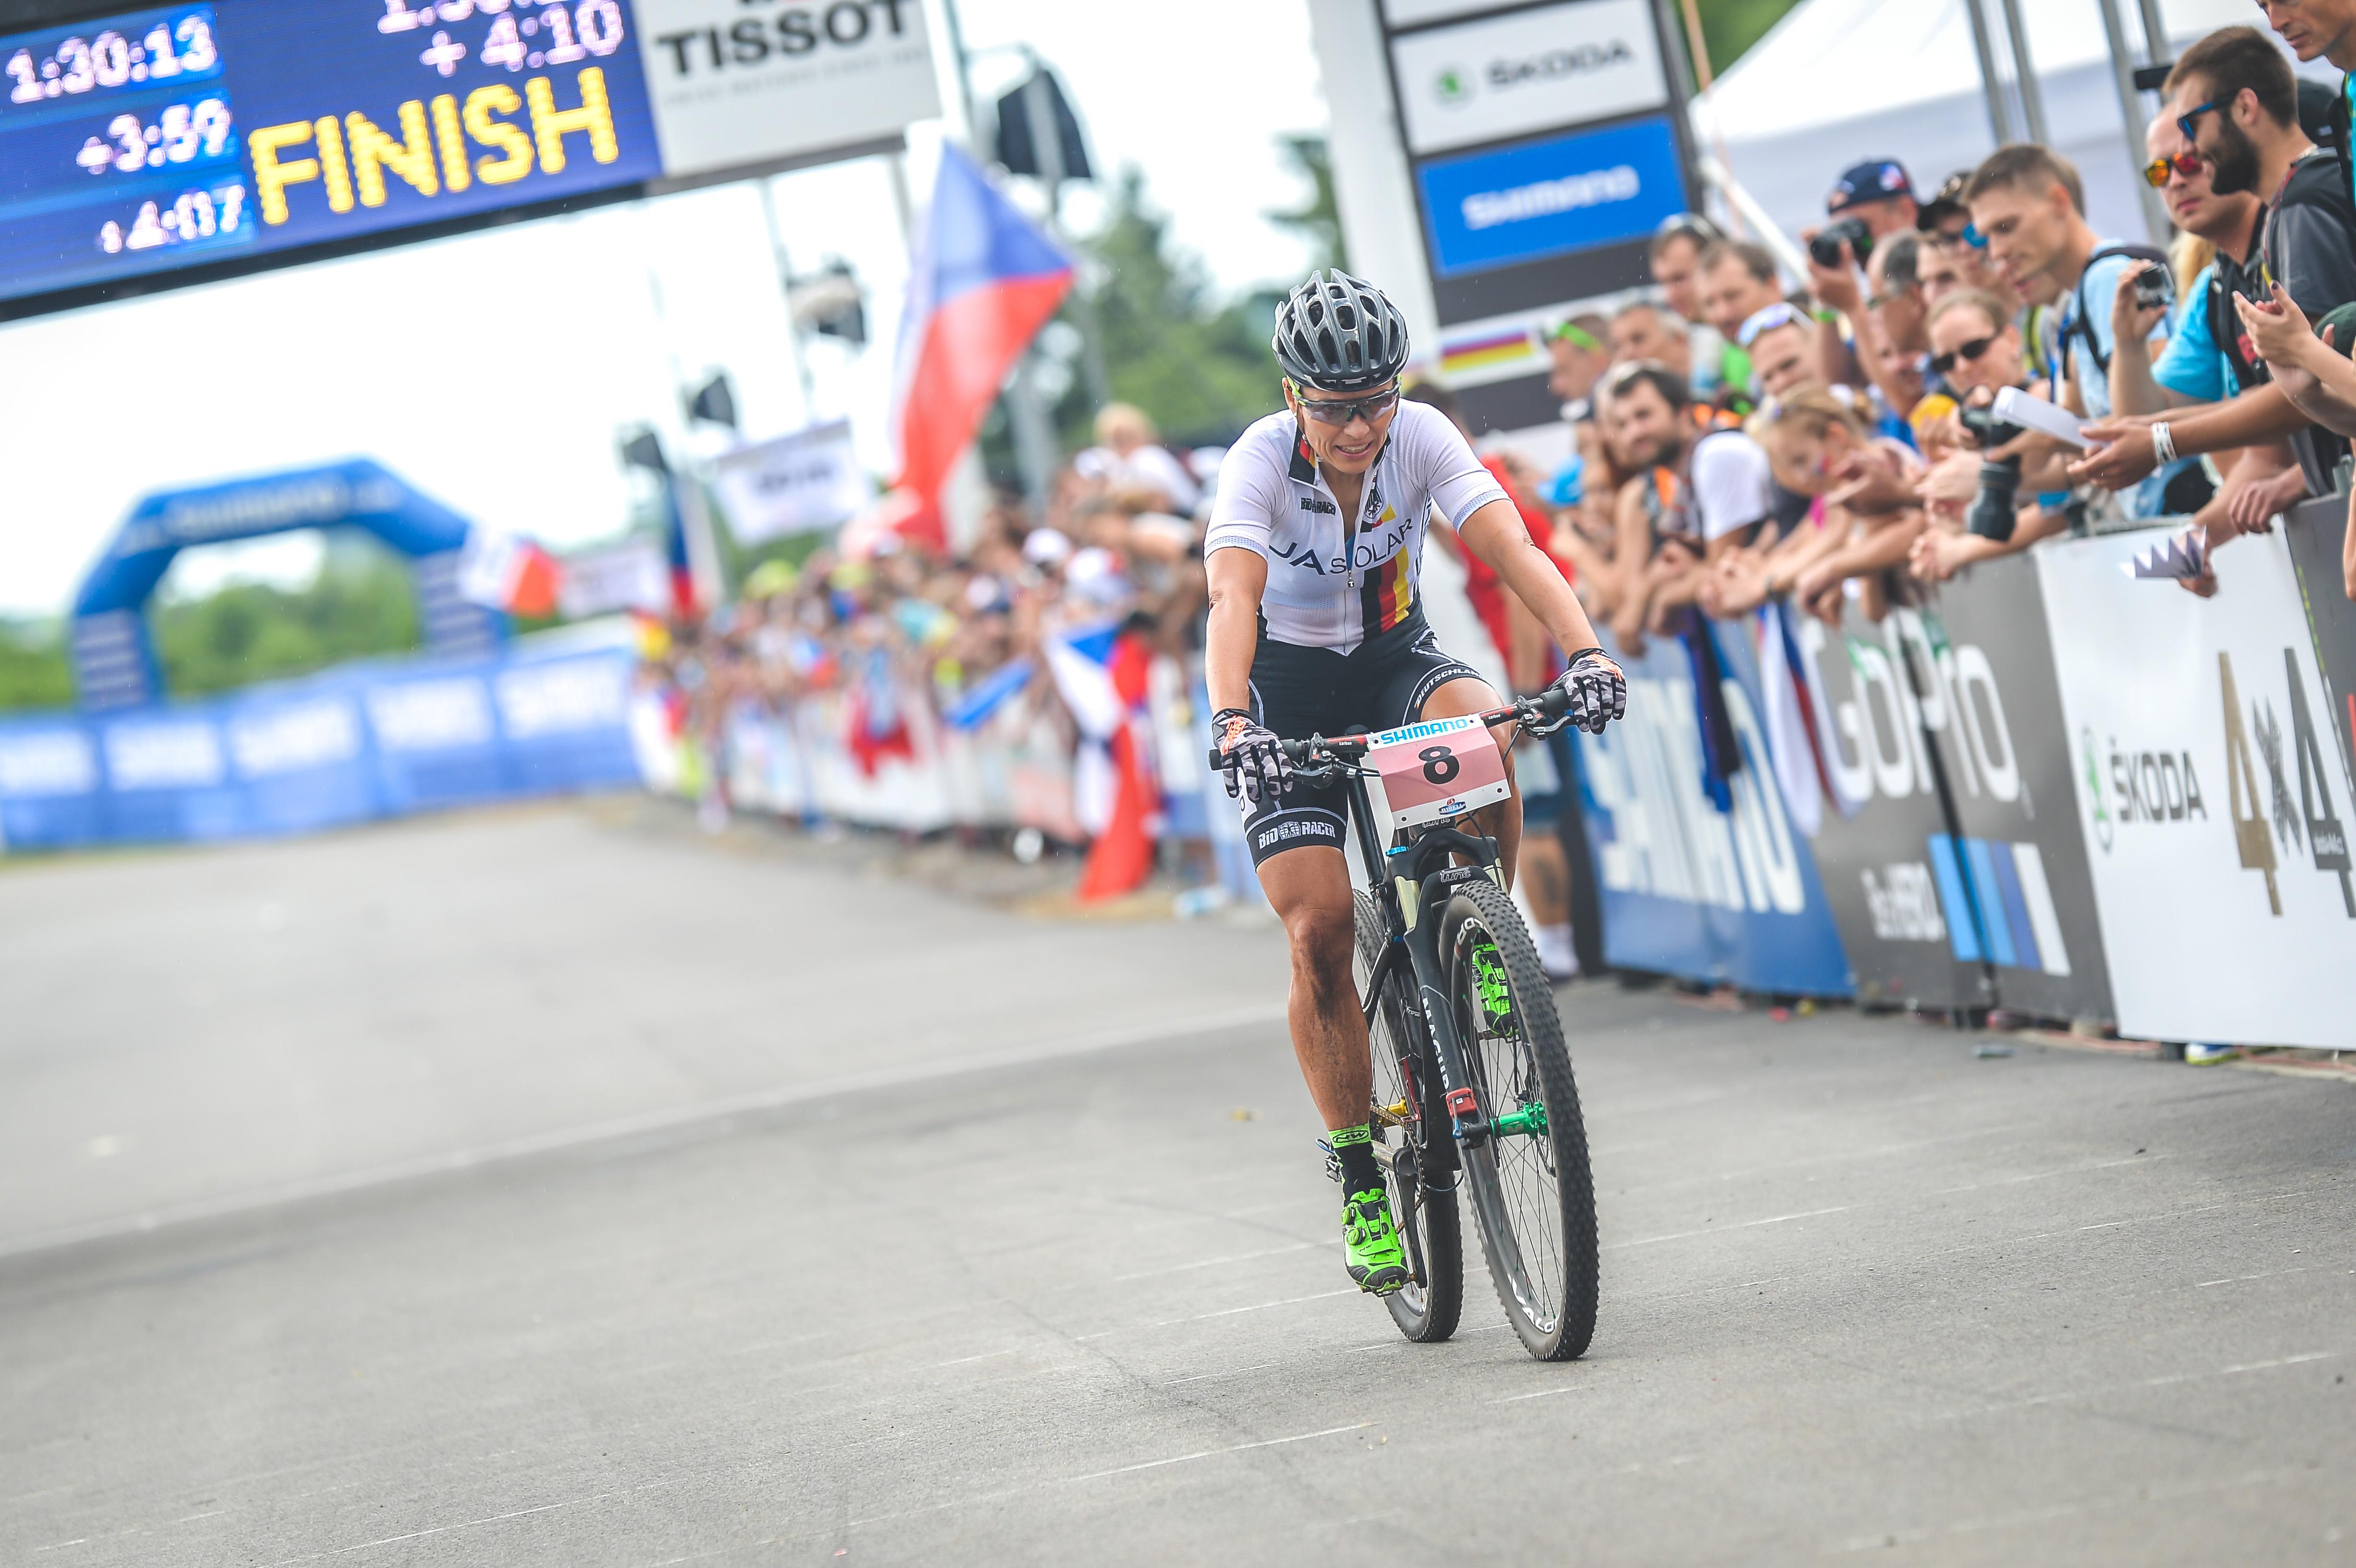 Sabine Spitz_NoveMesto_finish_by Traian Olinici